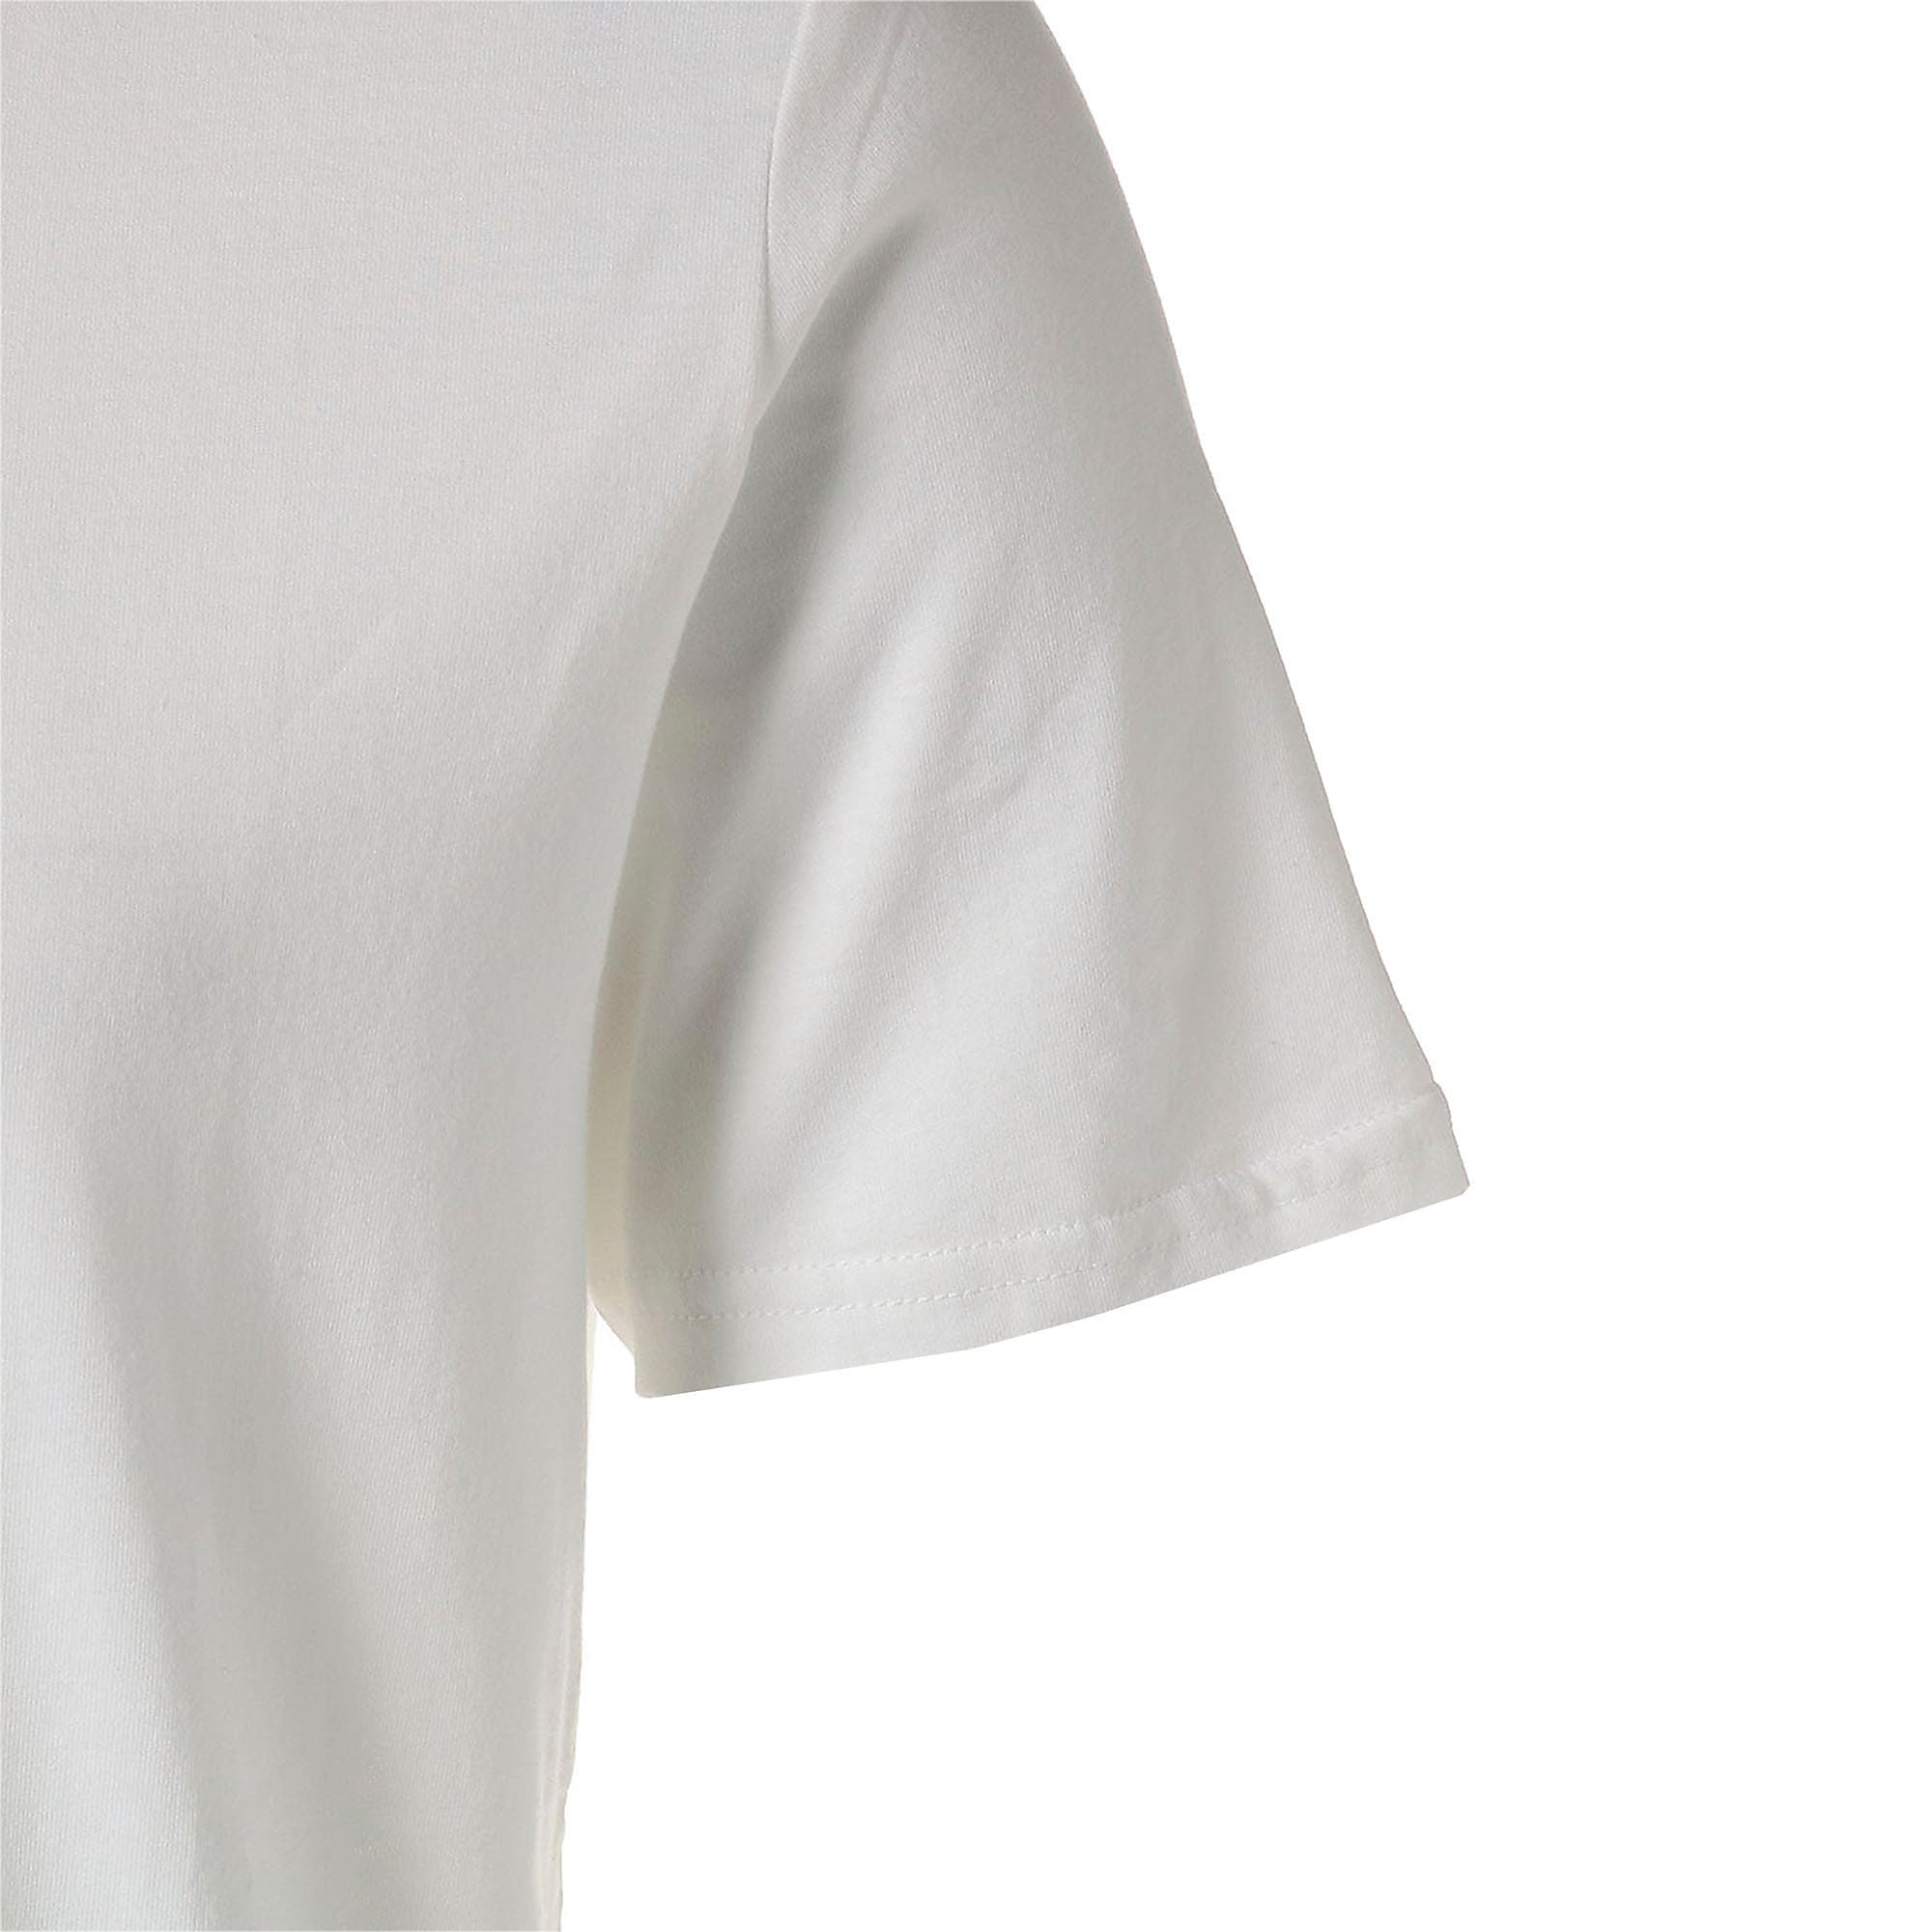 Thumbnail 8 of PUMA x LES BENJAMINS Tシャツ, Puma White, medium-JPN